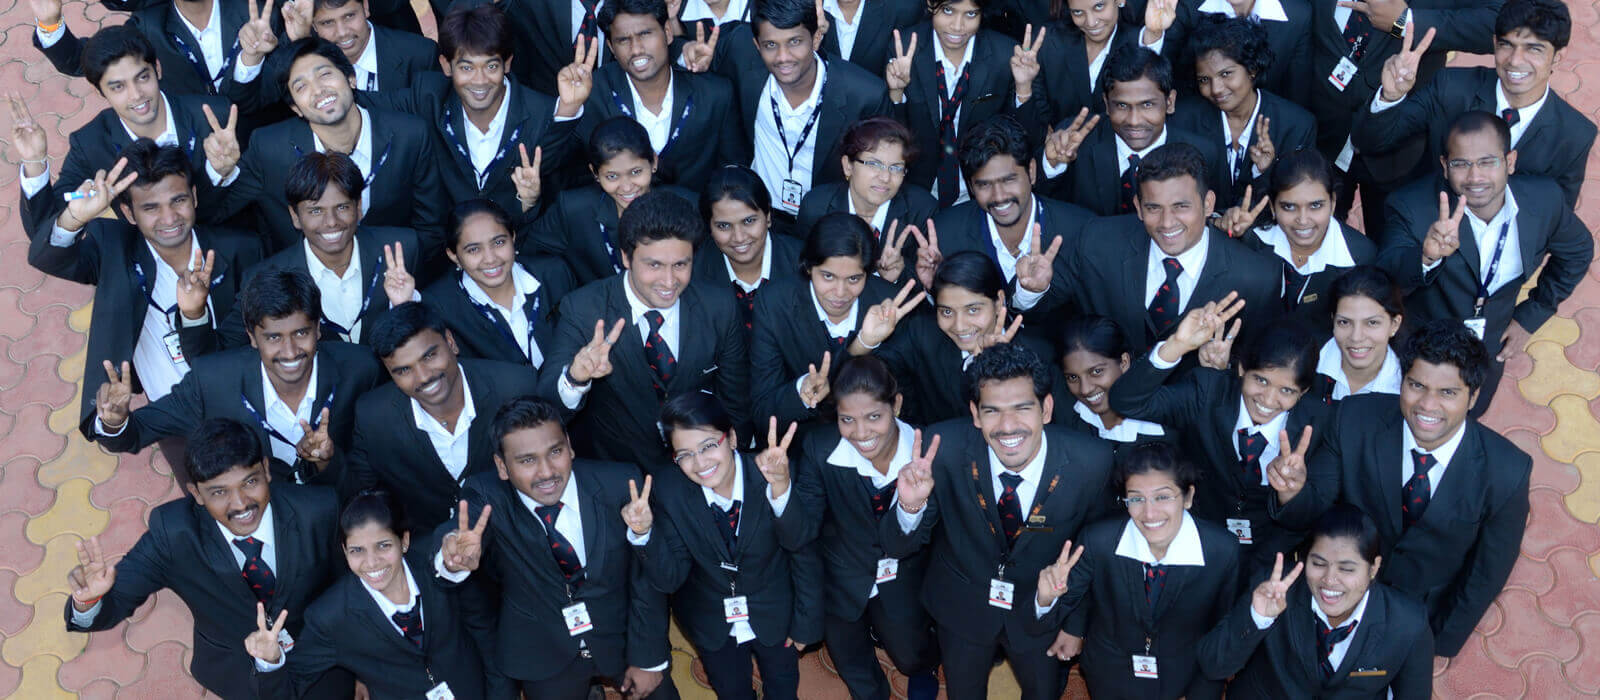 IBMR Students